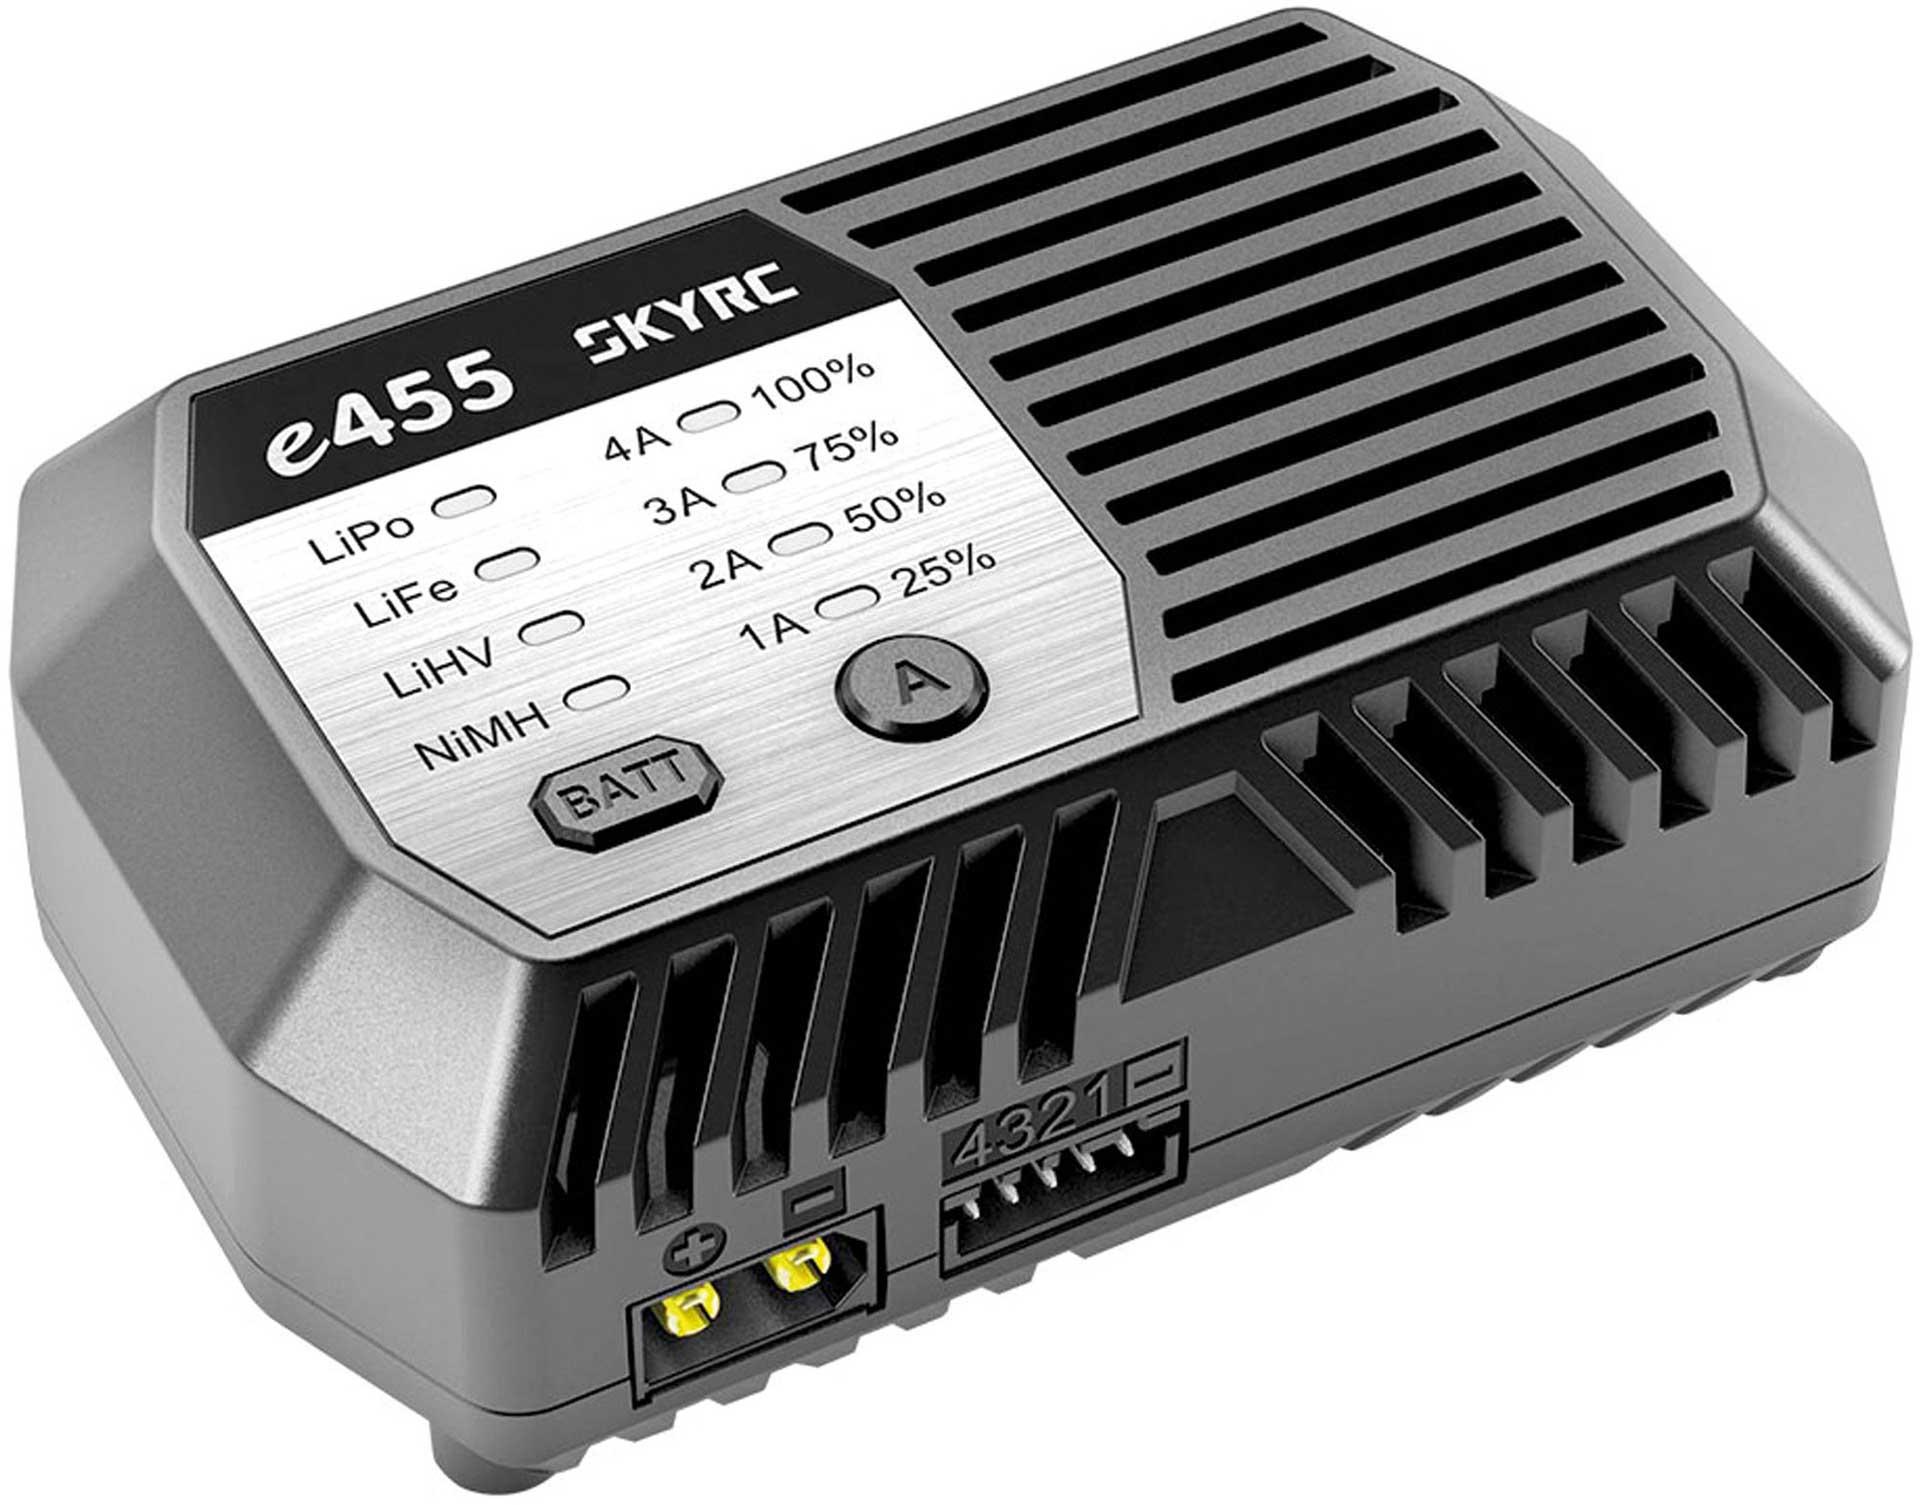 SKYRC e455 AC Charger NiMh 6-8 / LiPo 2-4s 1-4A 50W